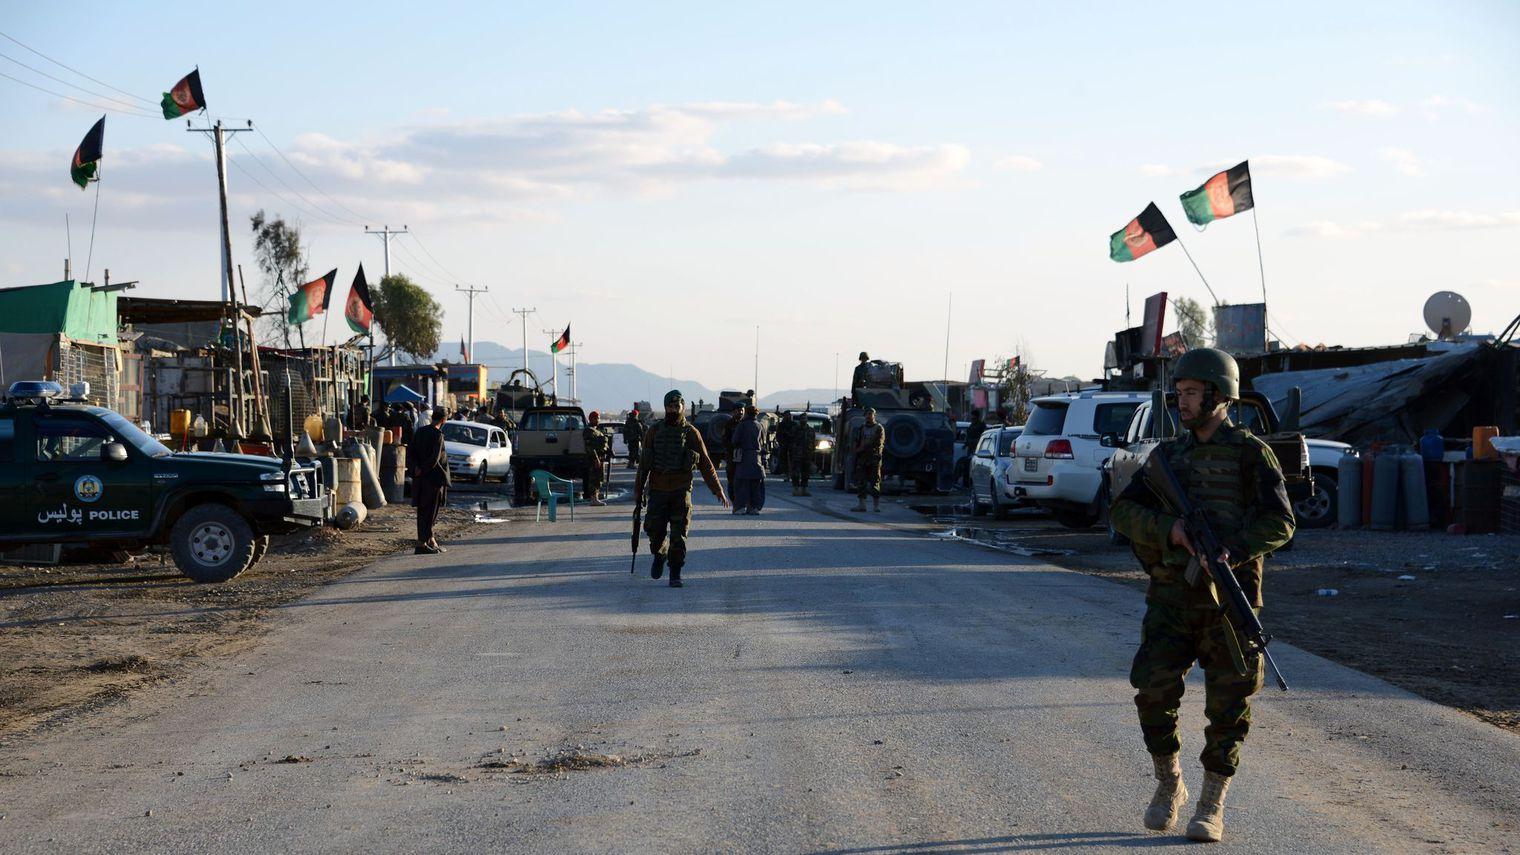 Le bilan de l'assaut taliban contre un aéroport atteint 50 morts